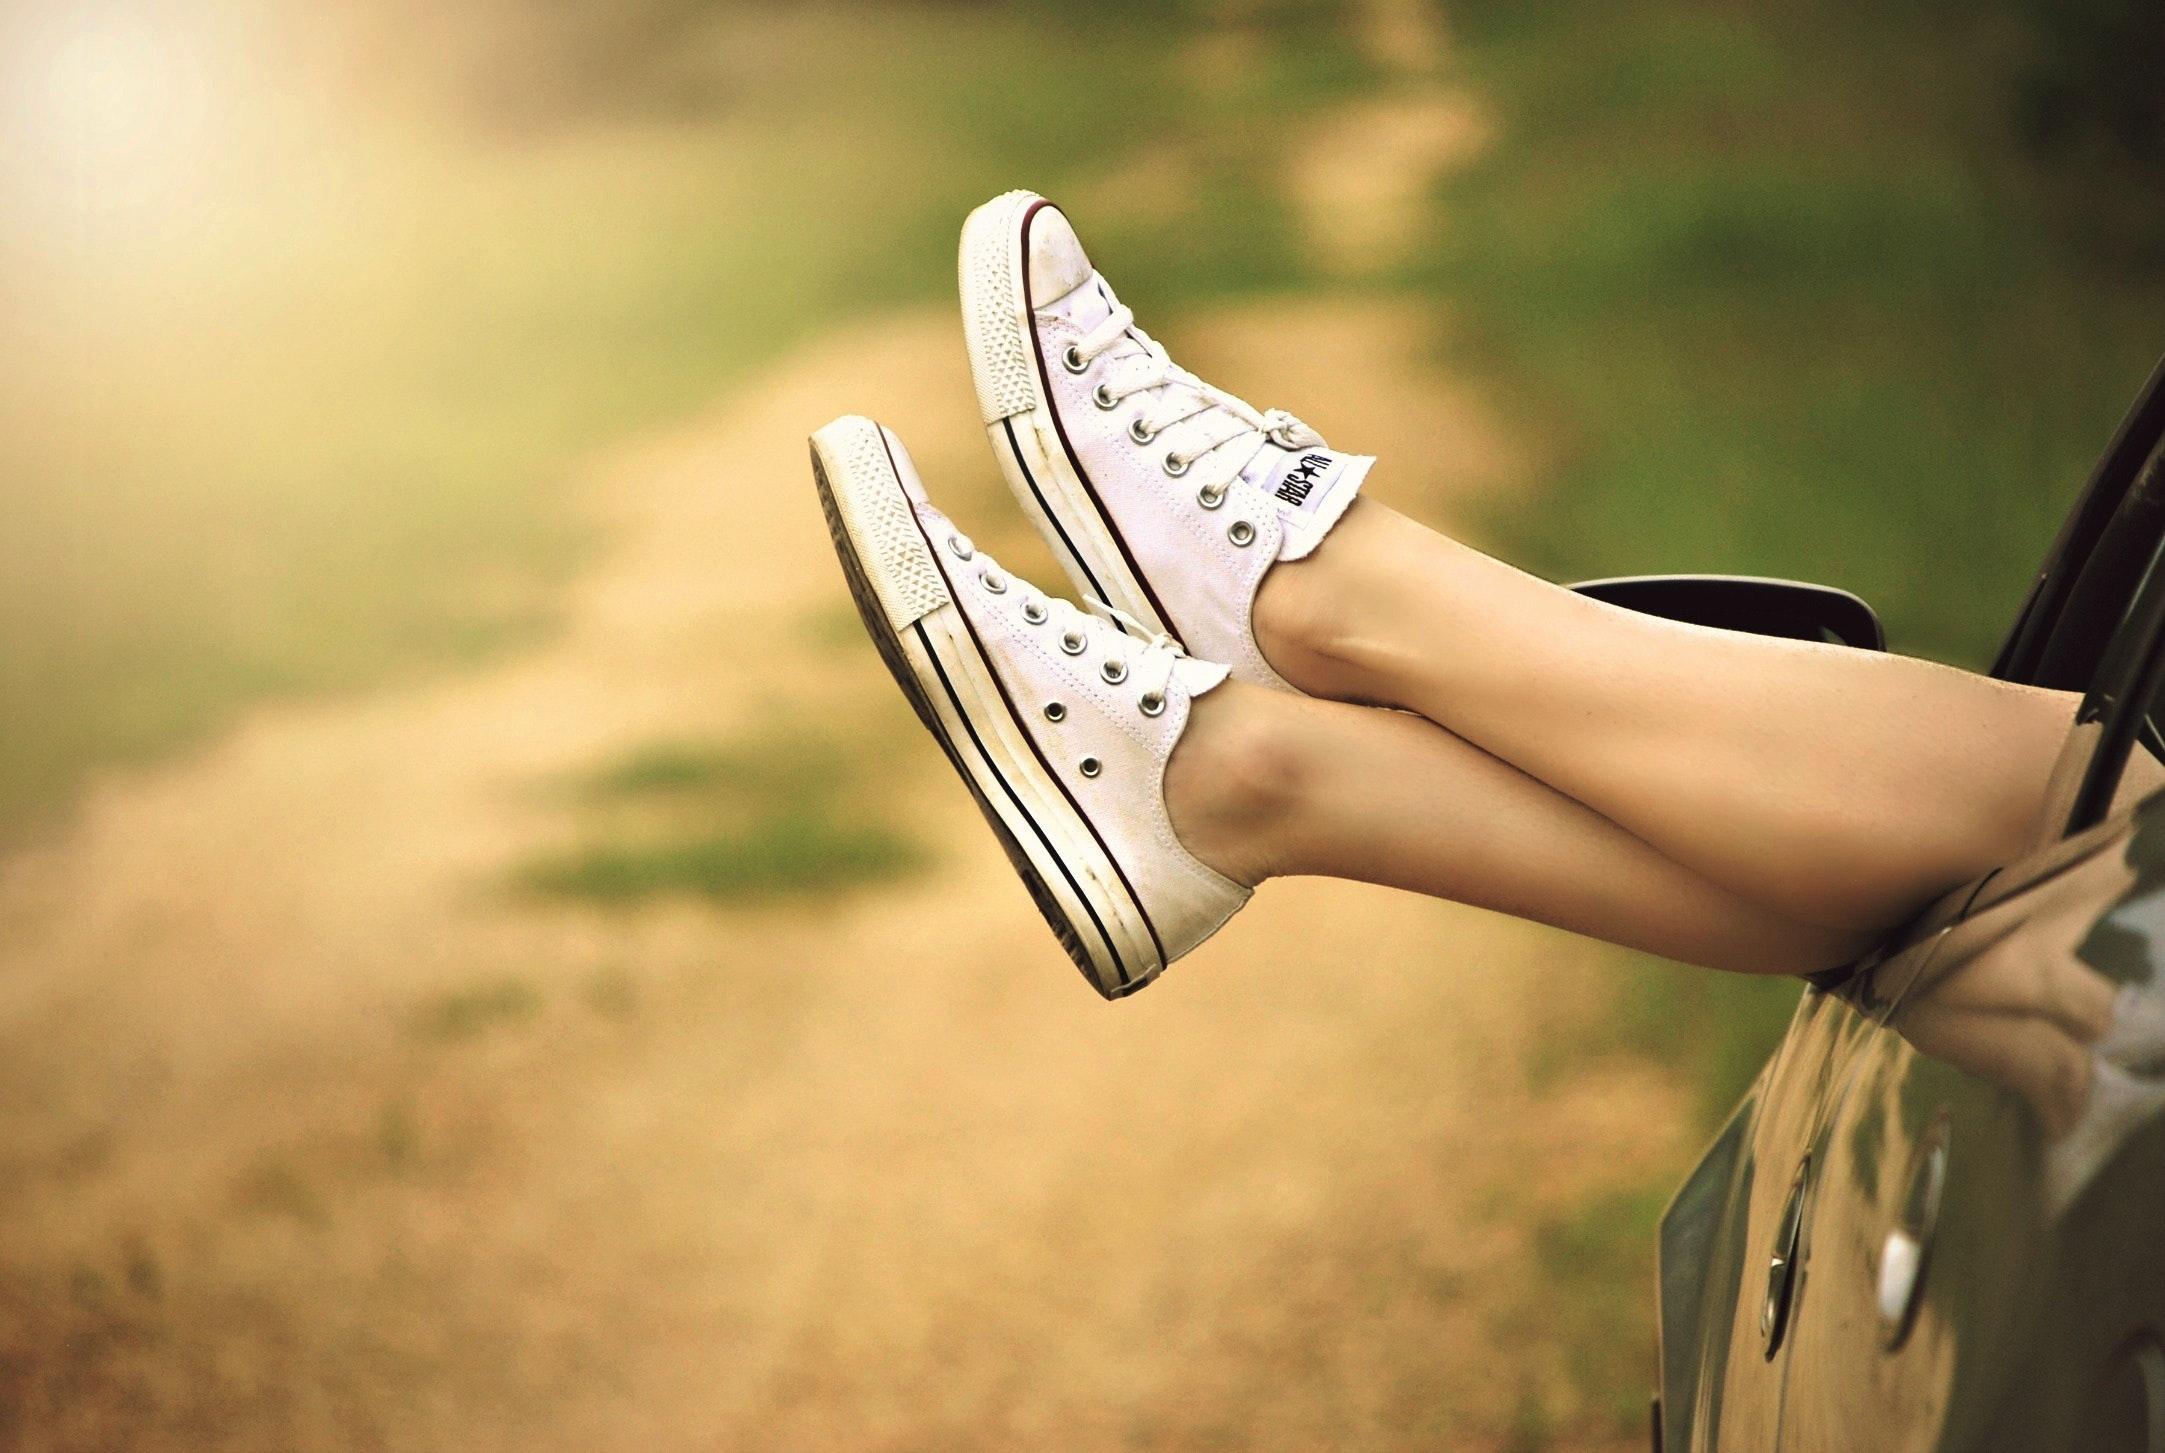 car-carefree-chucks-51397